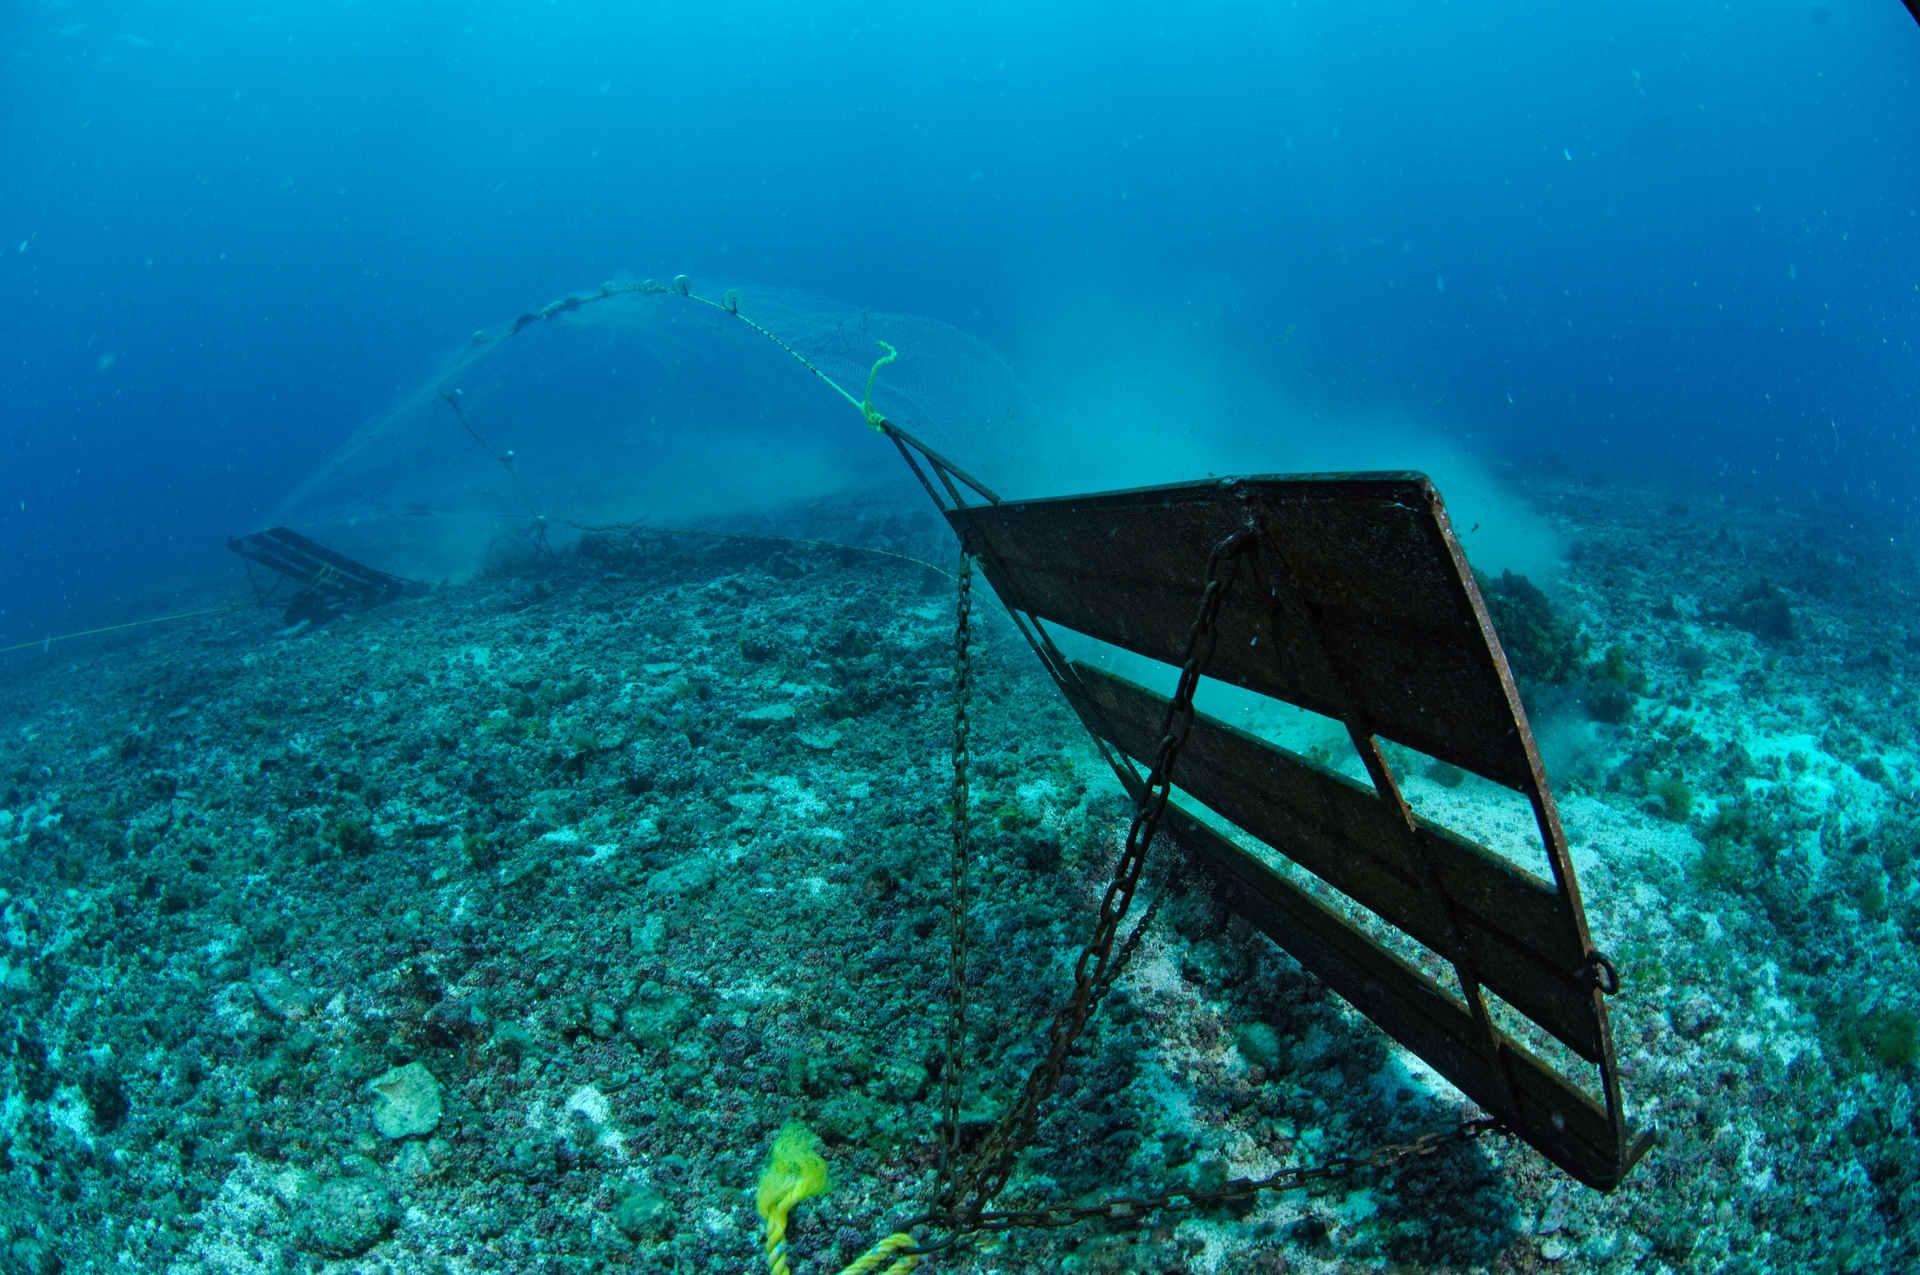 Fischfang: Grundschleppnetz zerstört den Meeresboden